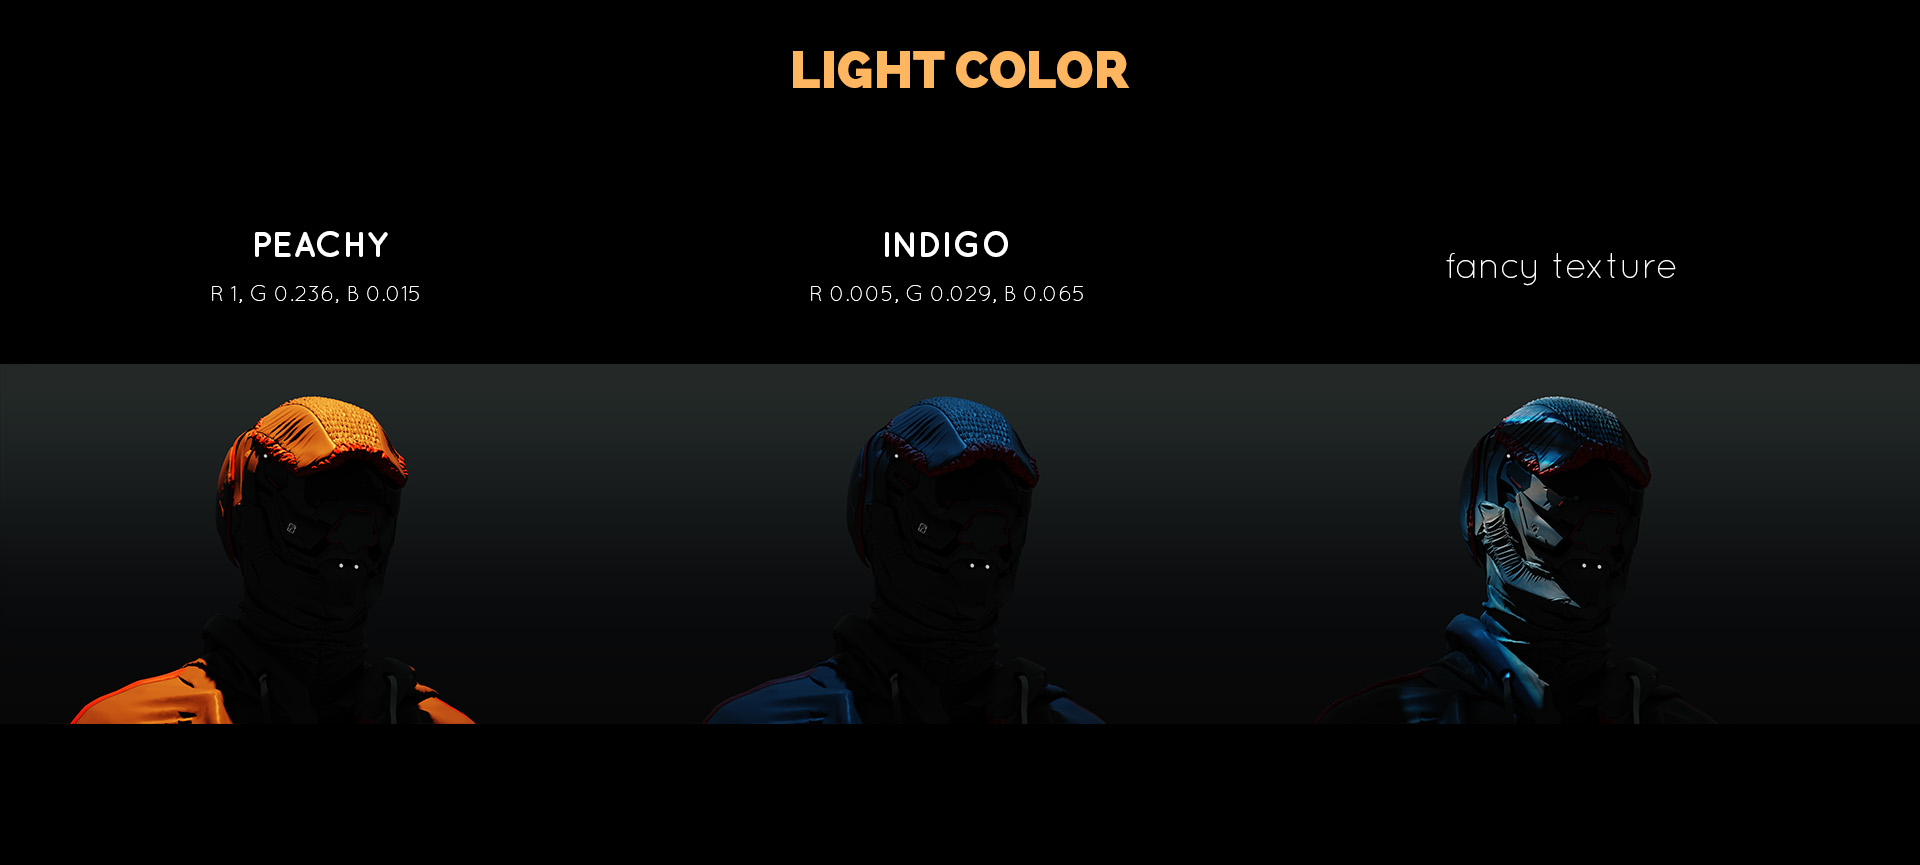 light color - lighting tutorial